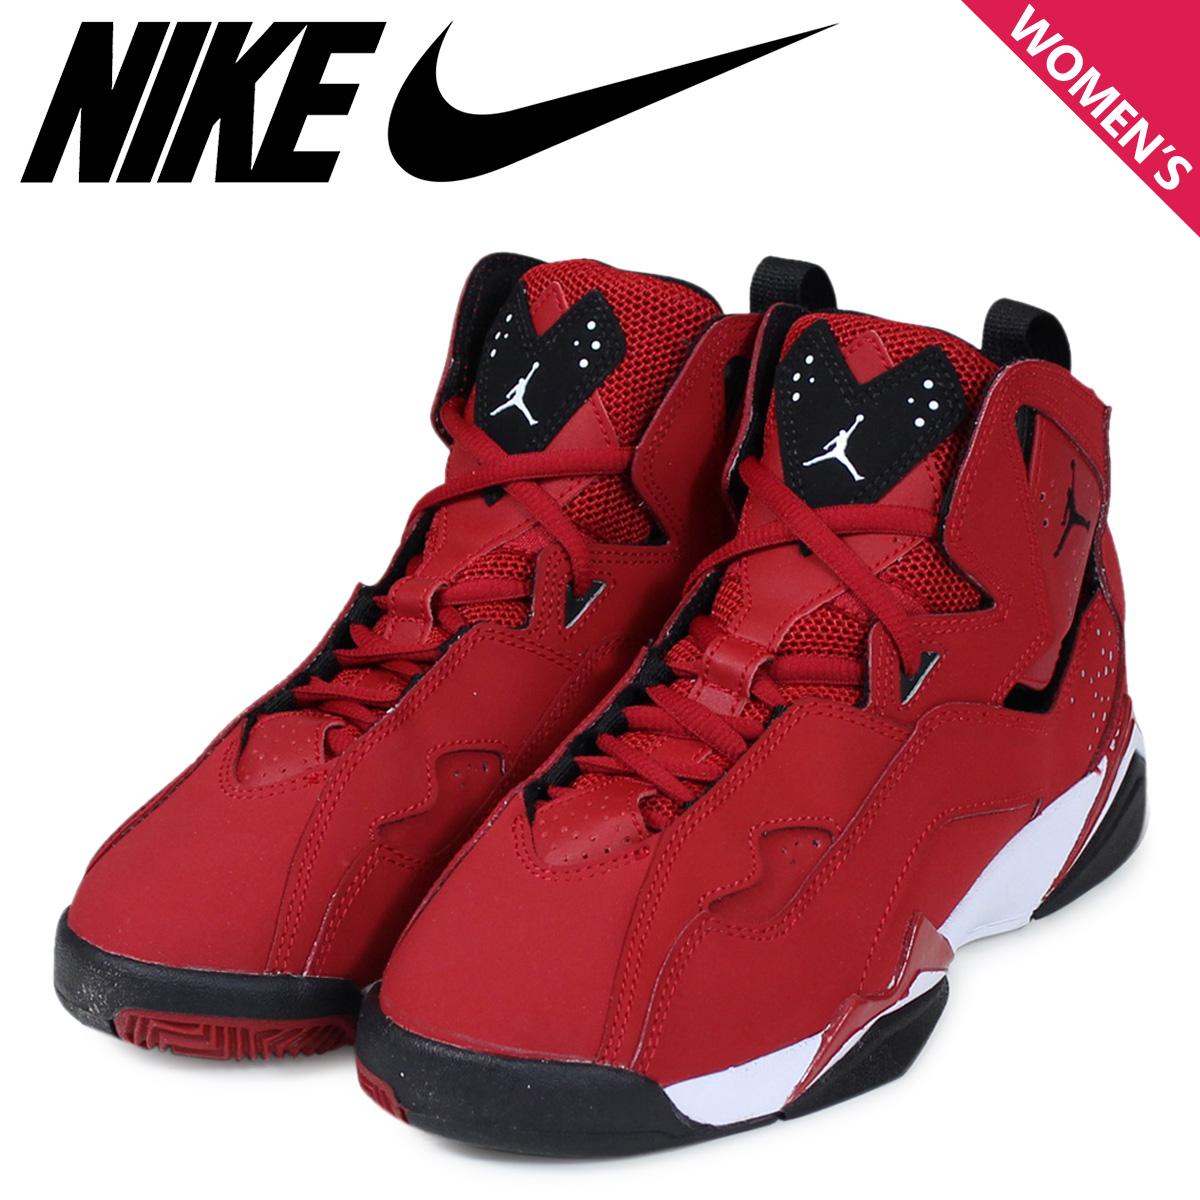 buy new jordan shoes online